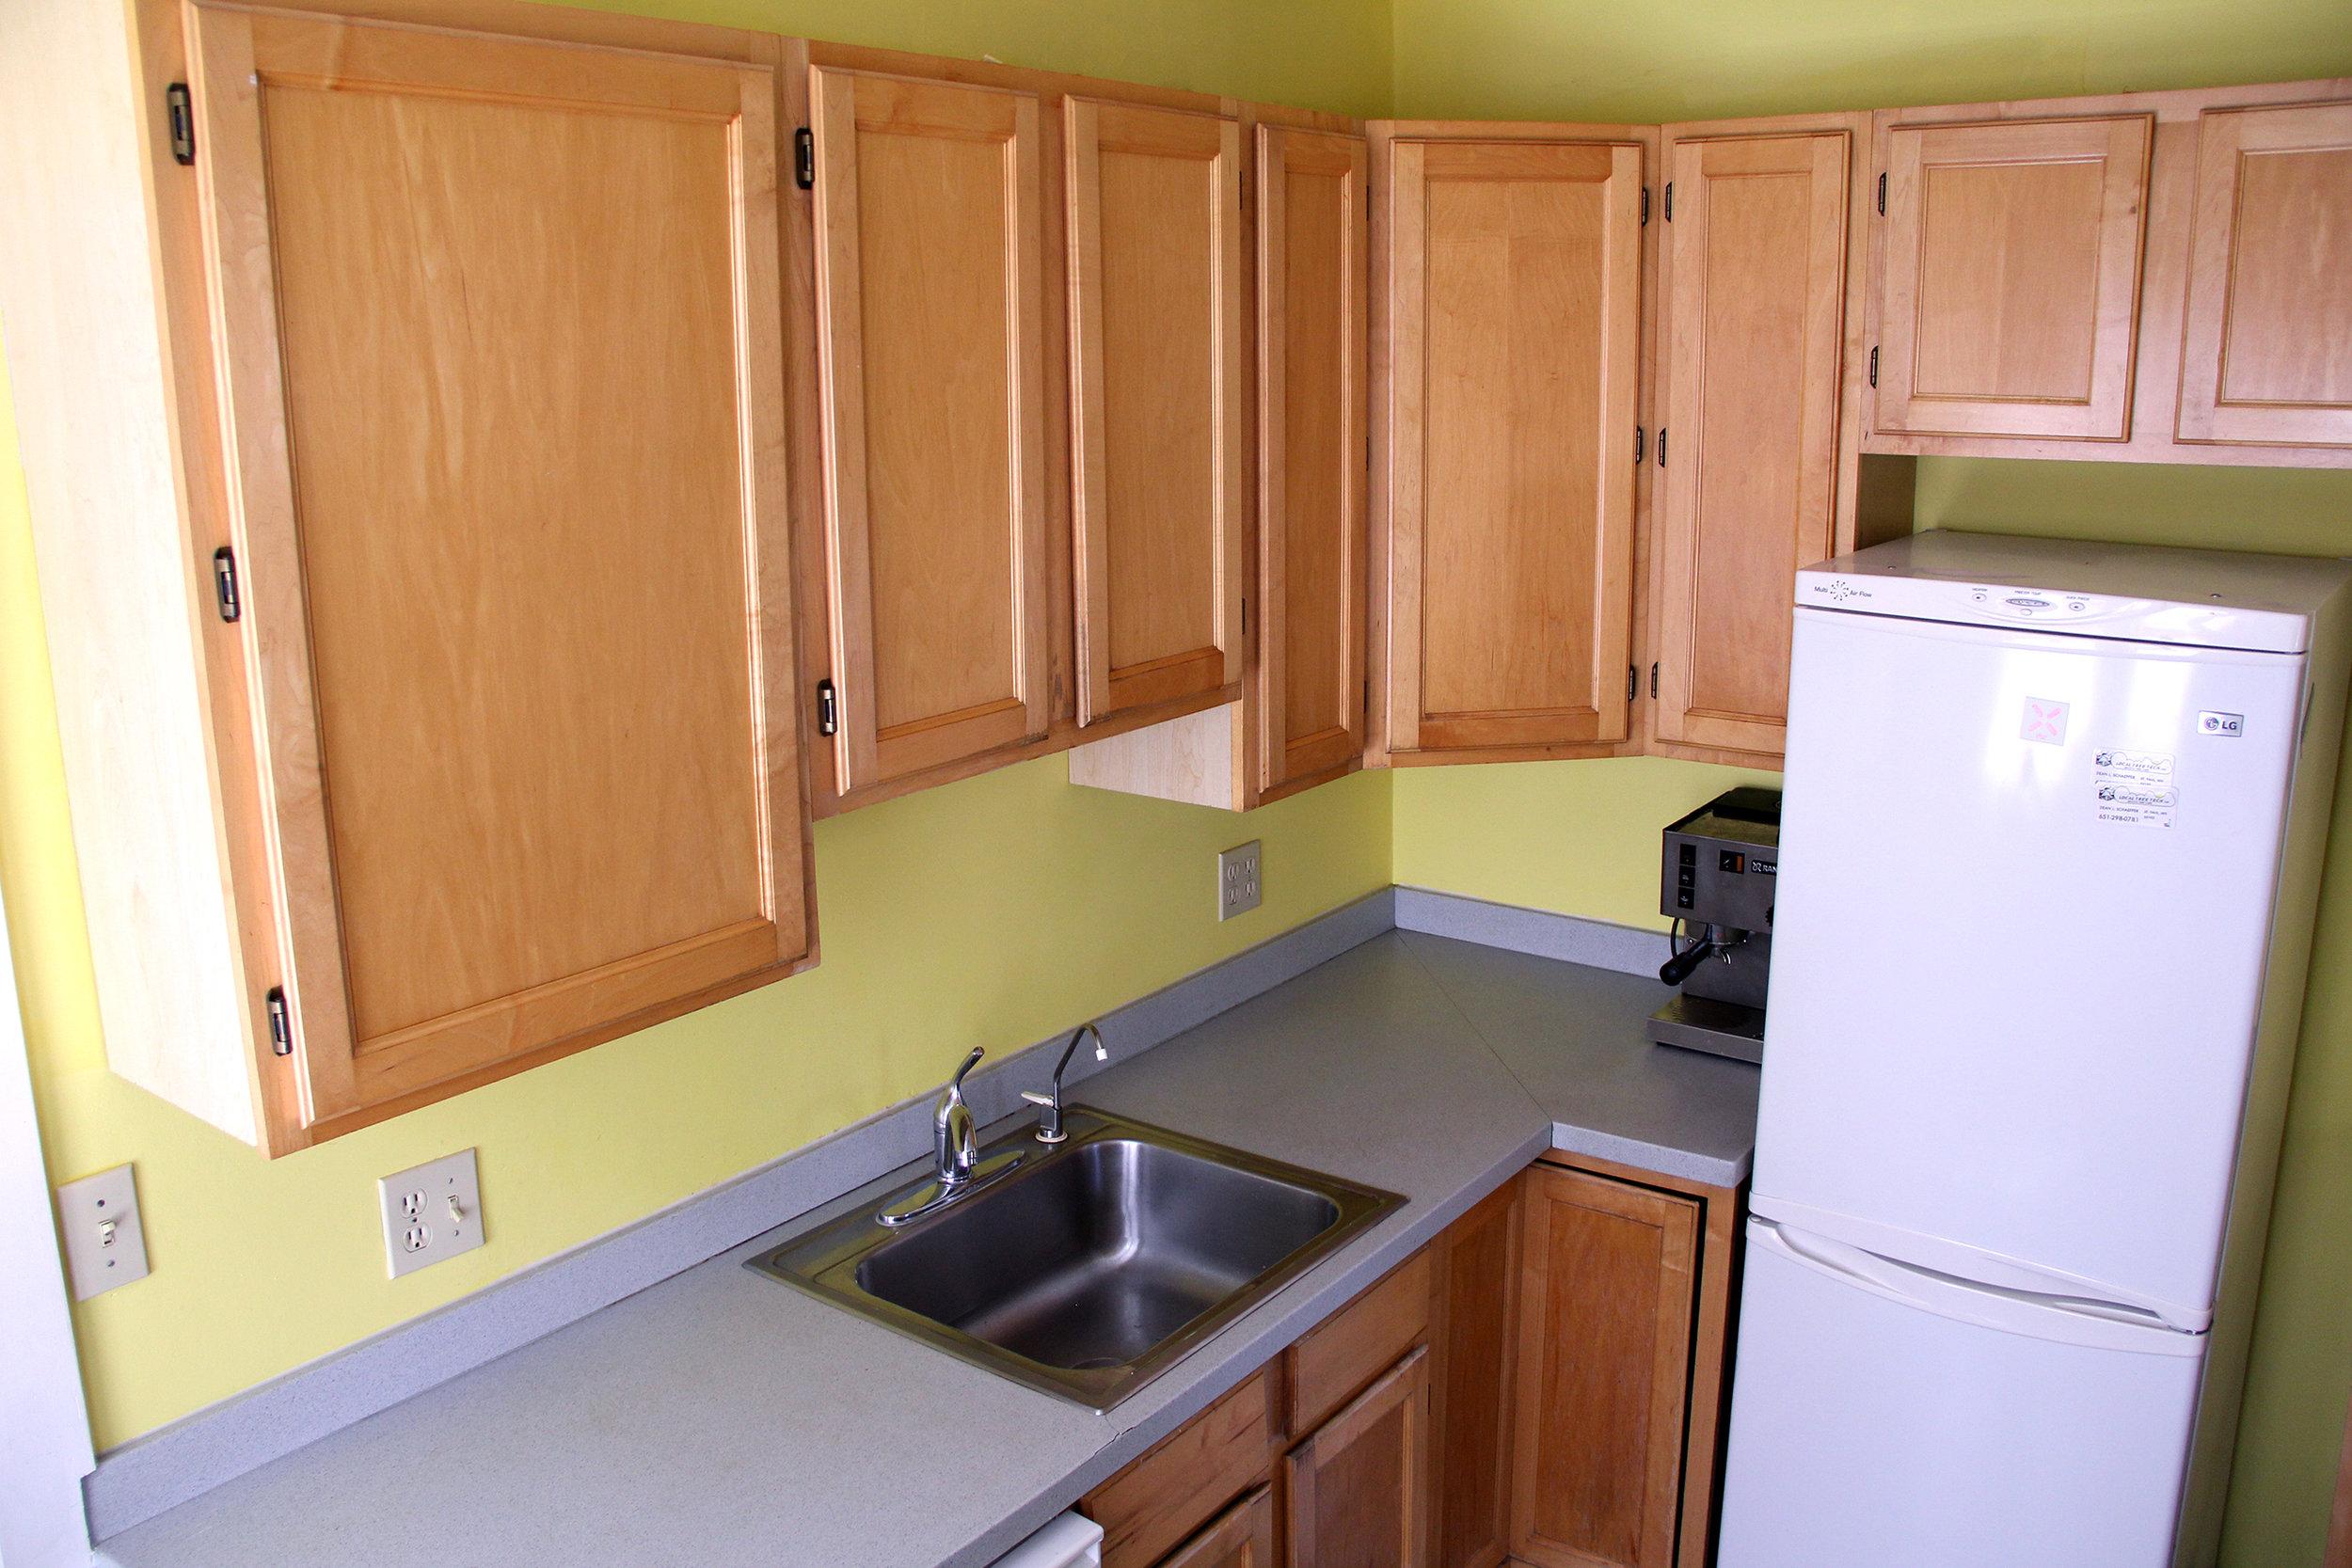 kitchen_27666179831_o.jpg